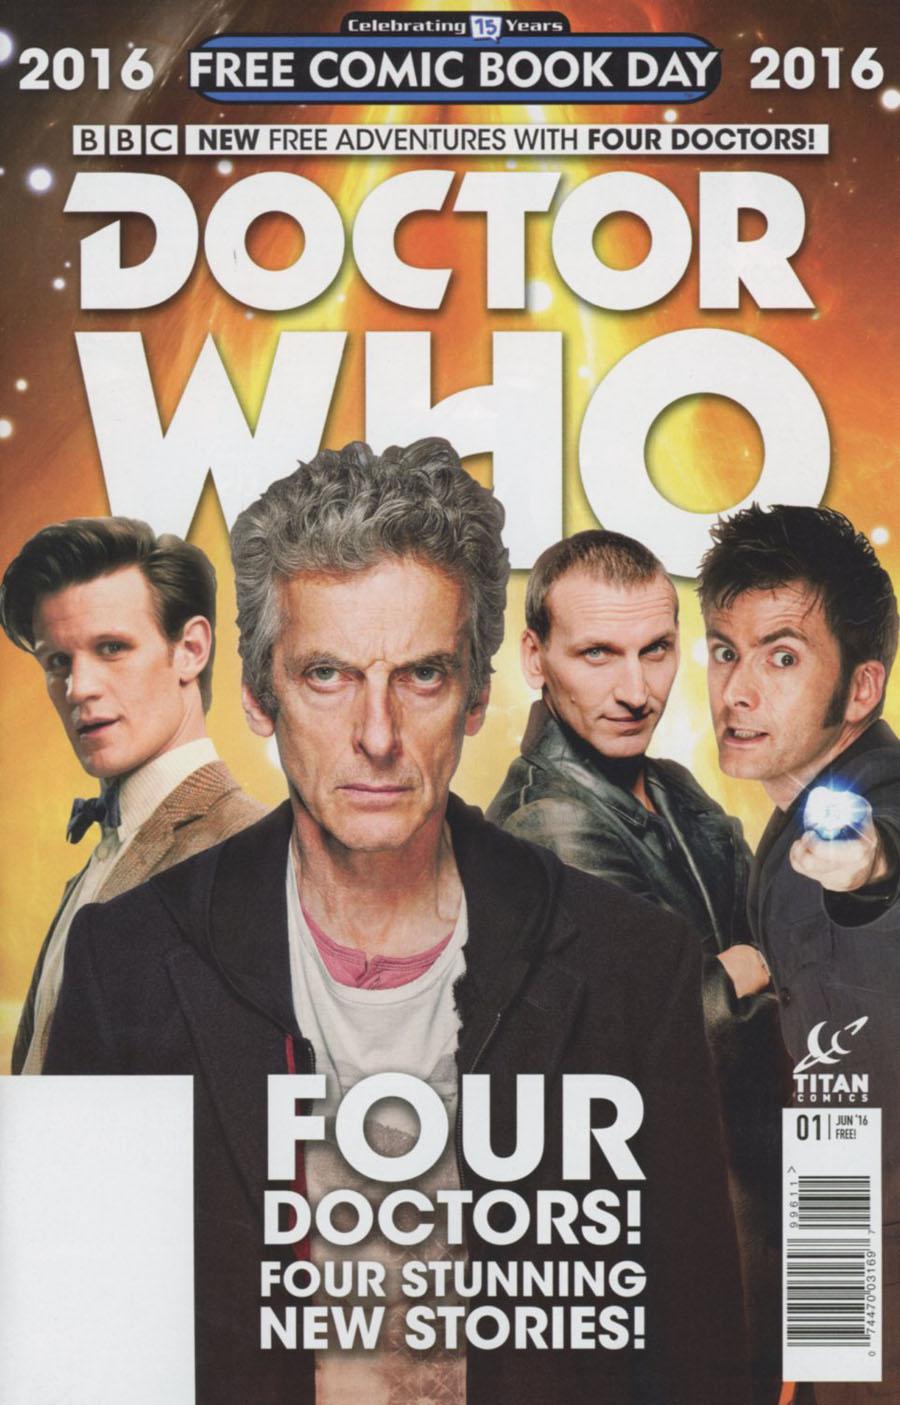 Doctor Who Four Doctors Special FCBD 2016